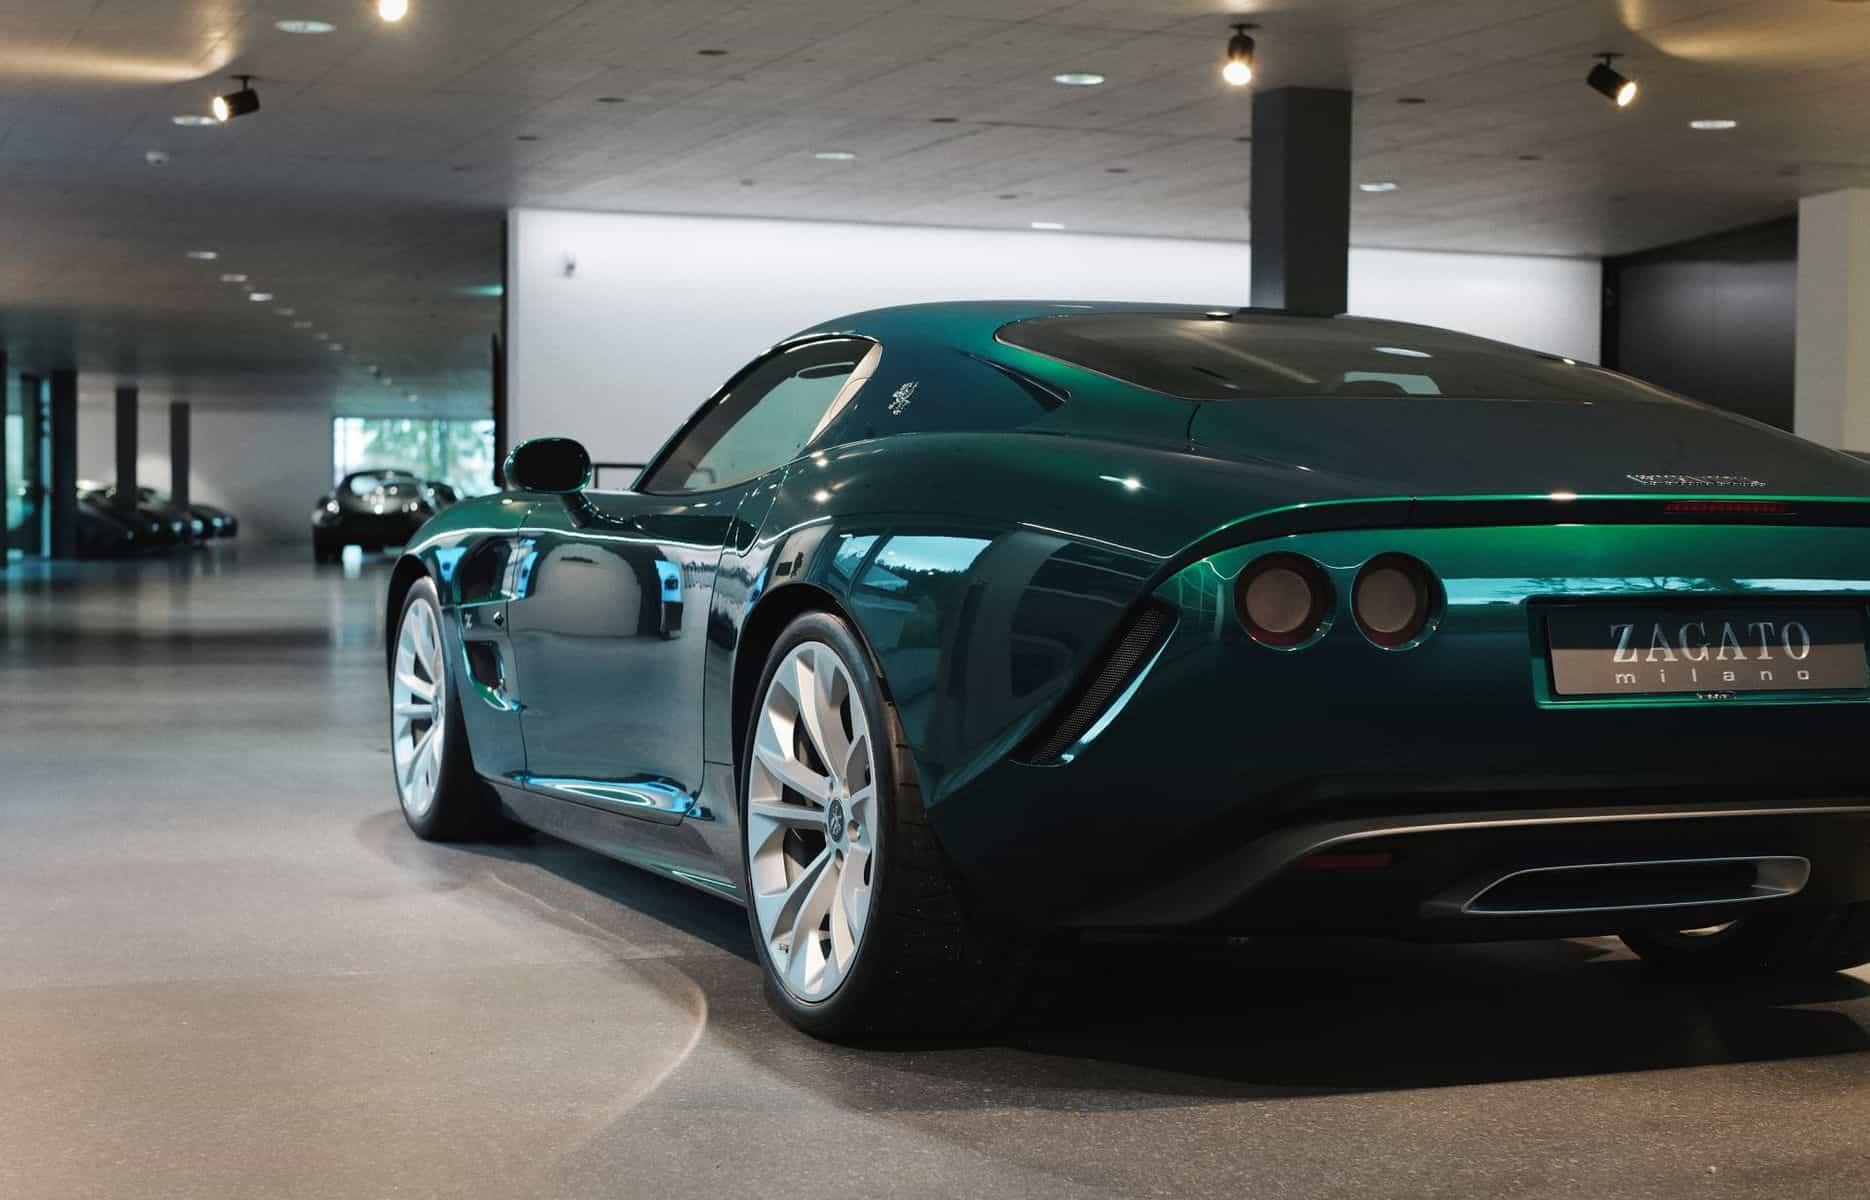 Zagato's First Iso Rivolta GTZ 7